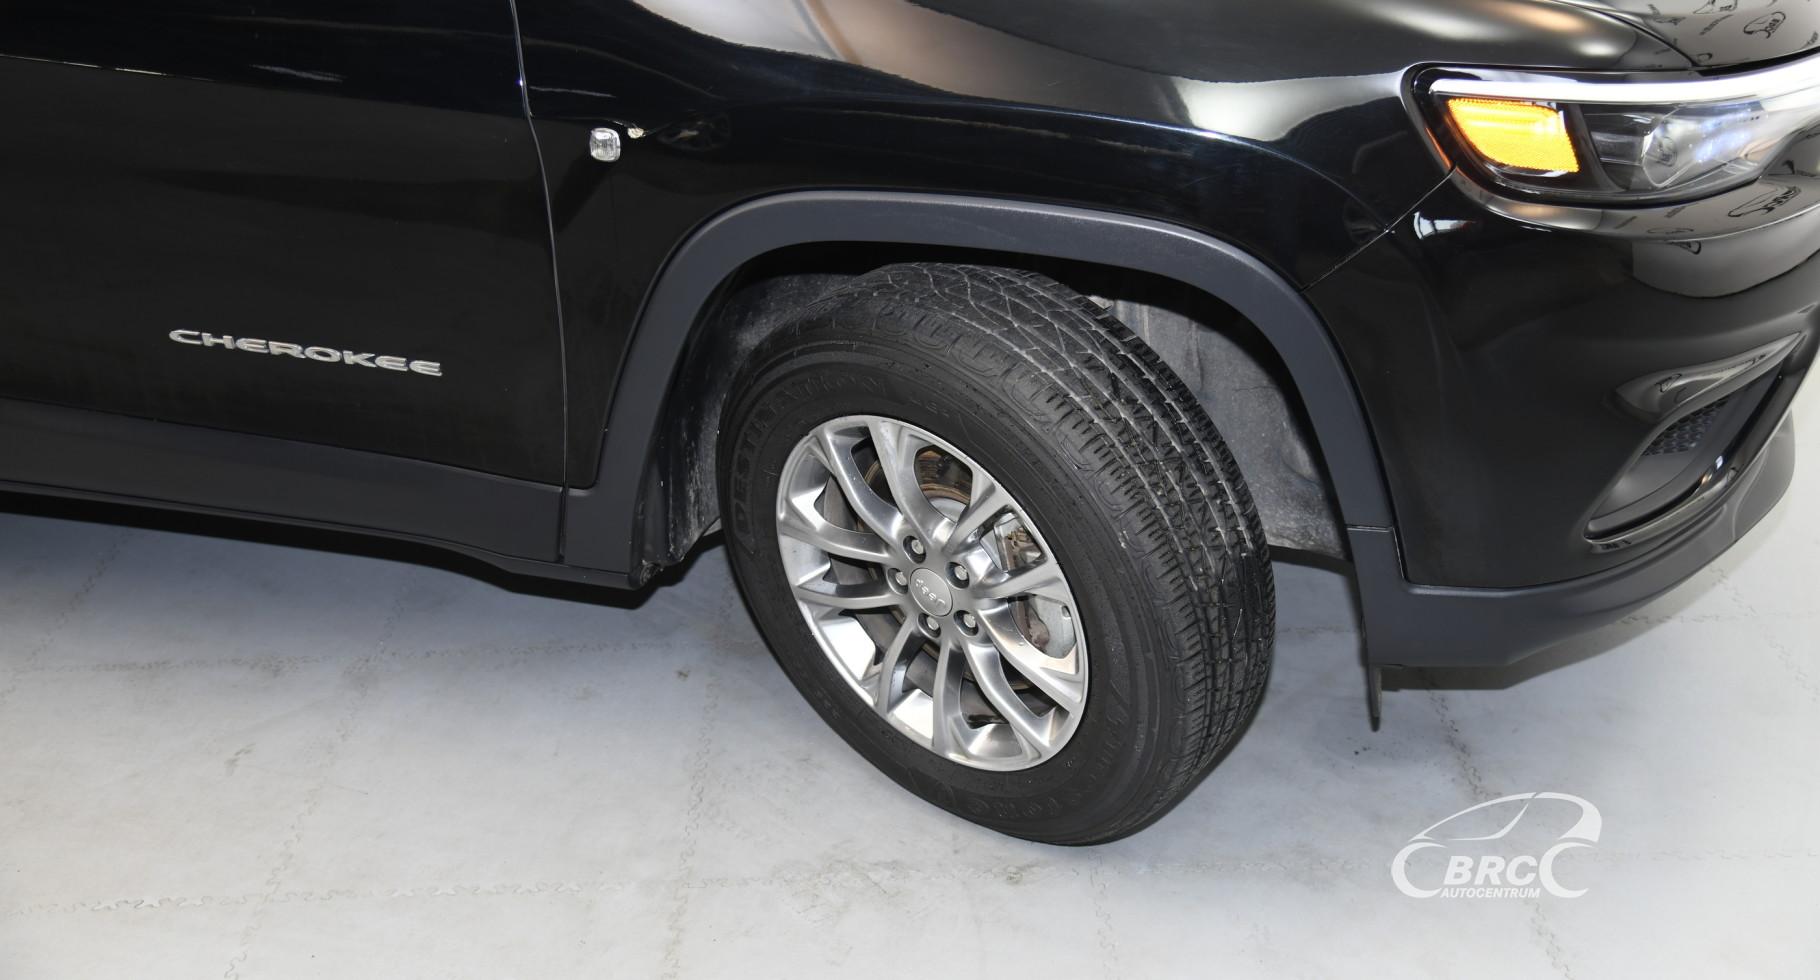 Jeep Cherokee 2.4i 4WD Latitude Automatas